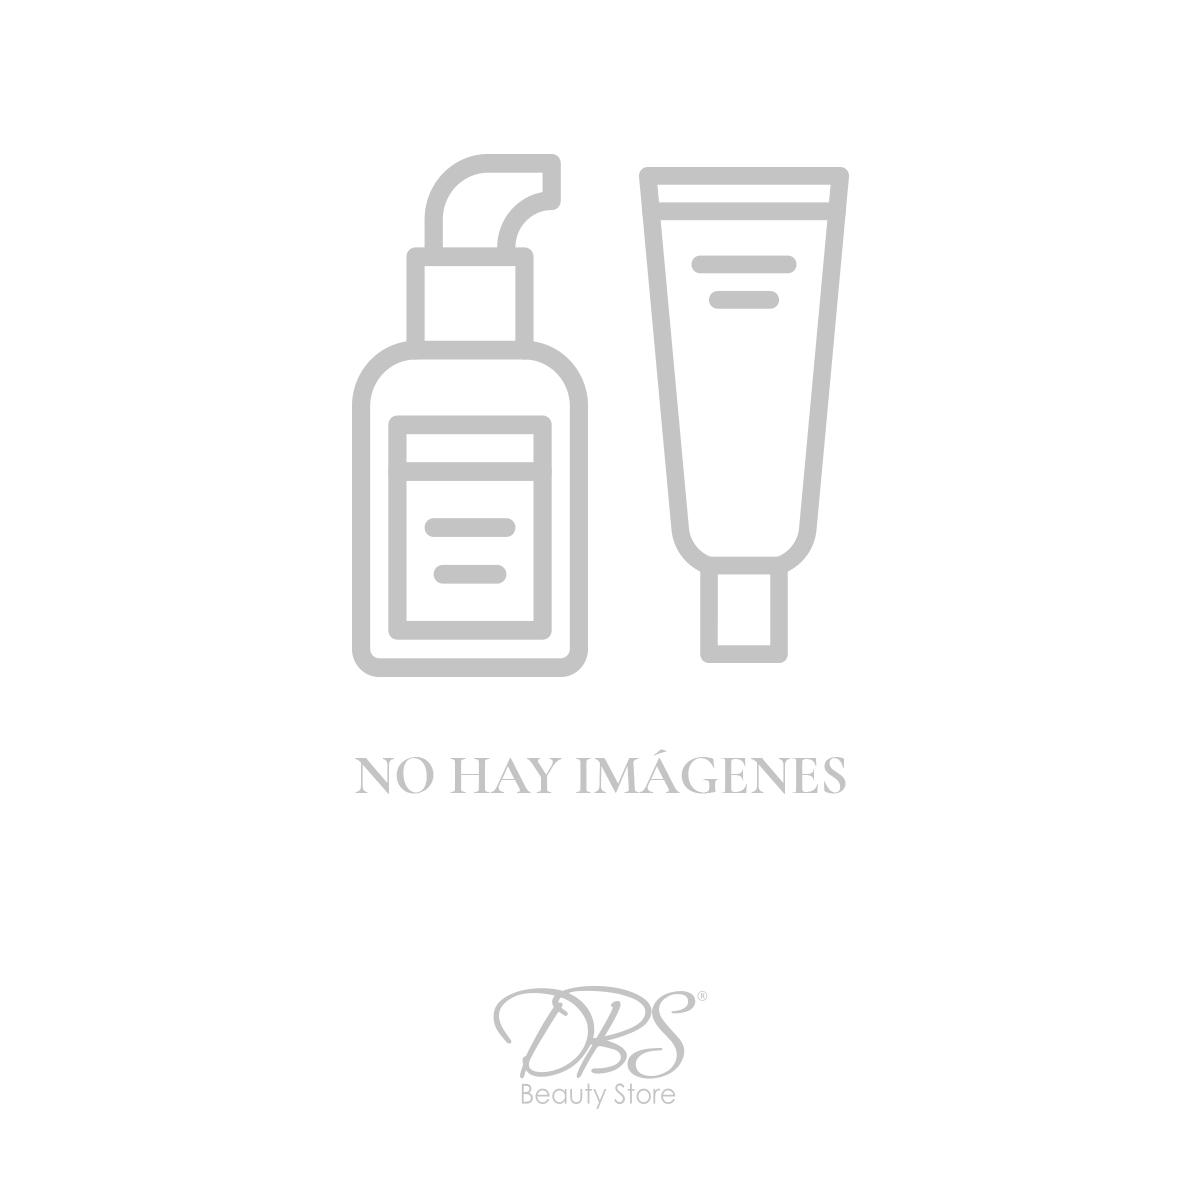 beauty-tools-BY-YS014-MP.jpg